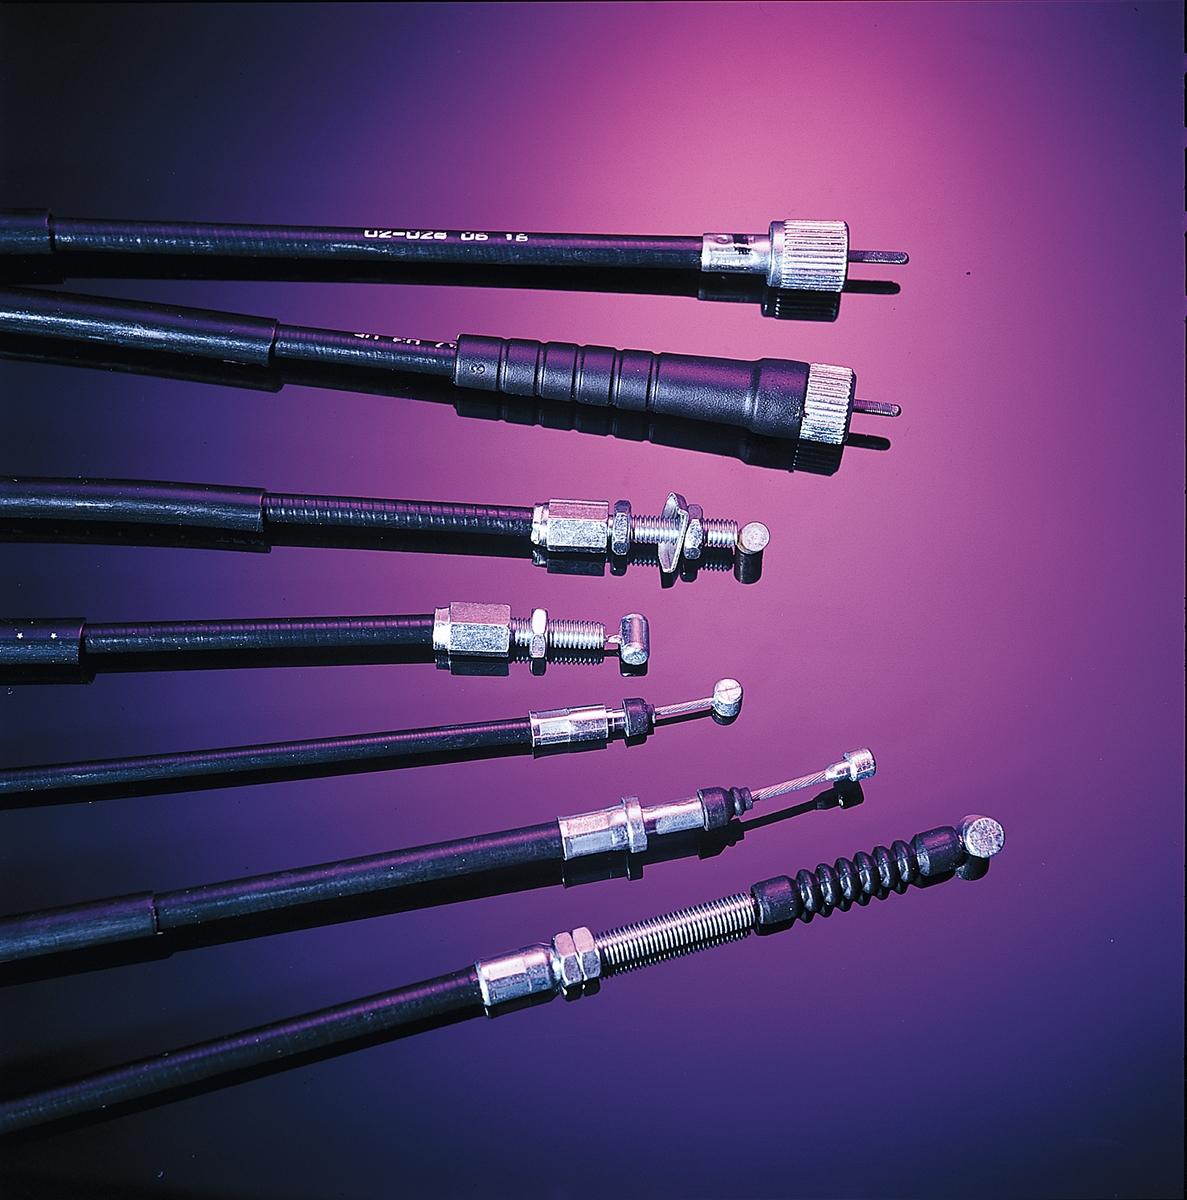 Black Vinyl Push Throttle Cable~1986 Kawasaki EN450A 454 LTD Motion Pro 03-0220